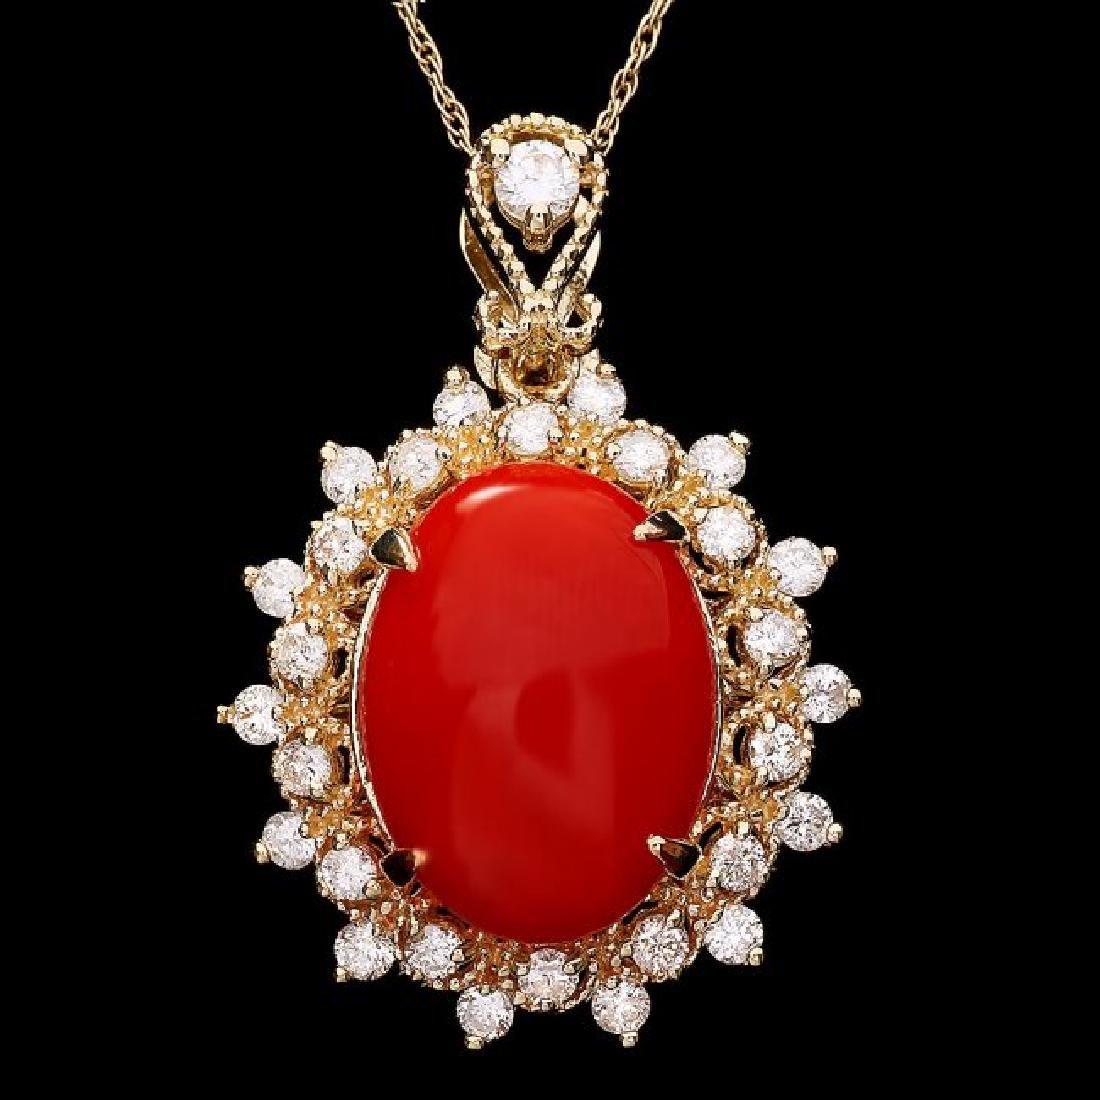 14k Gold 4.70ct Coral 0.80ct Diamond Pendant